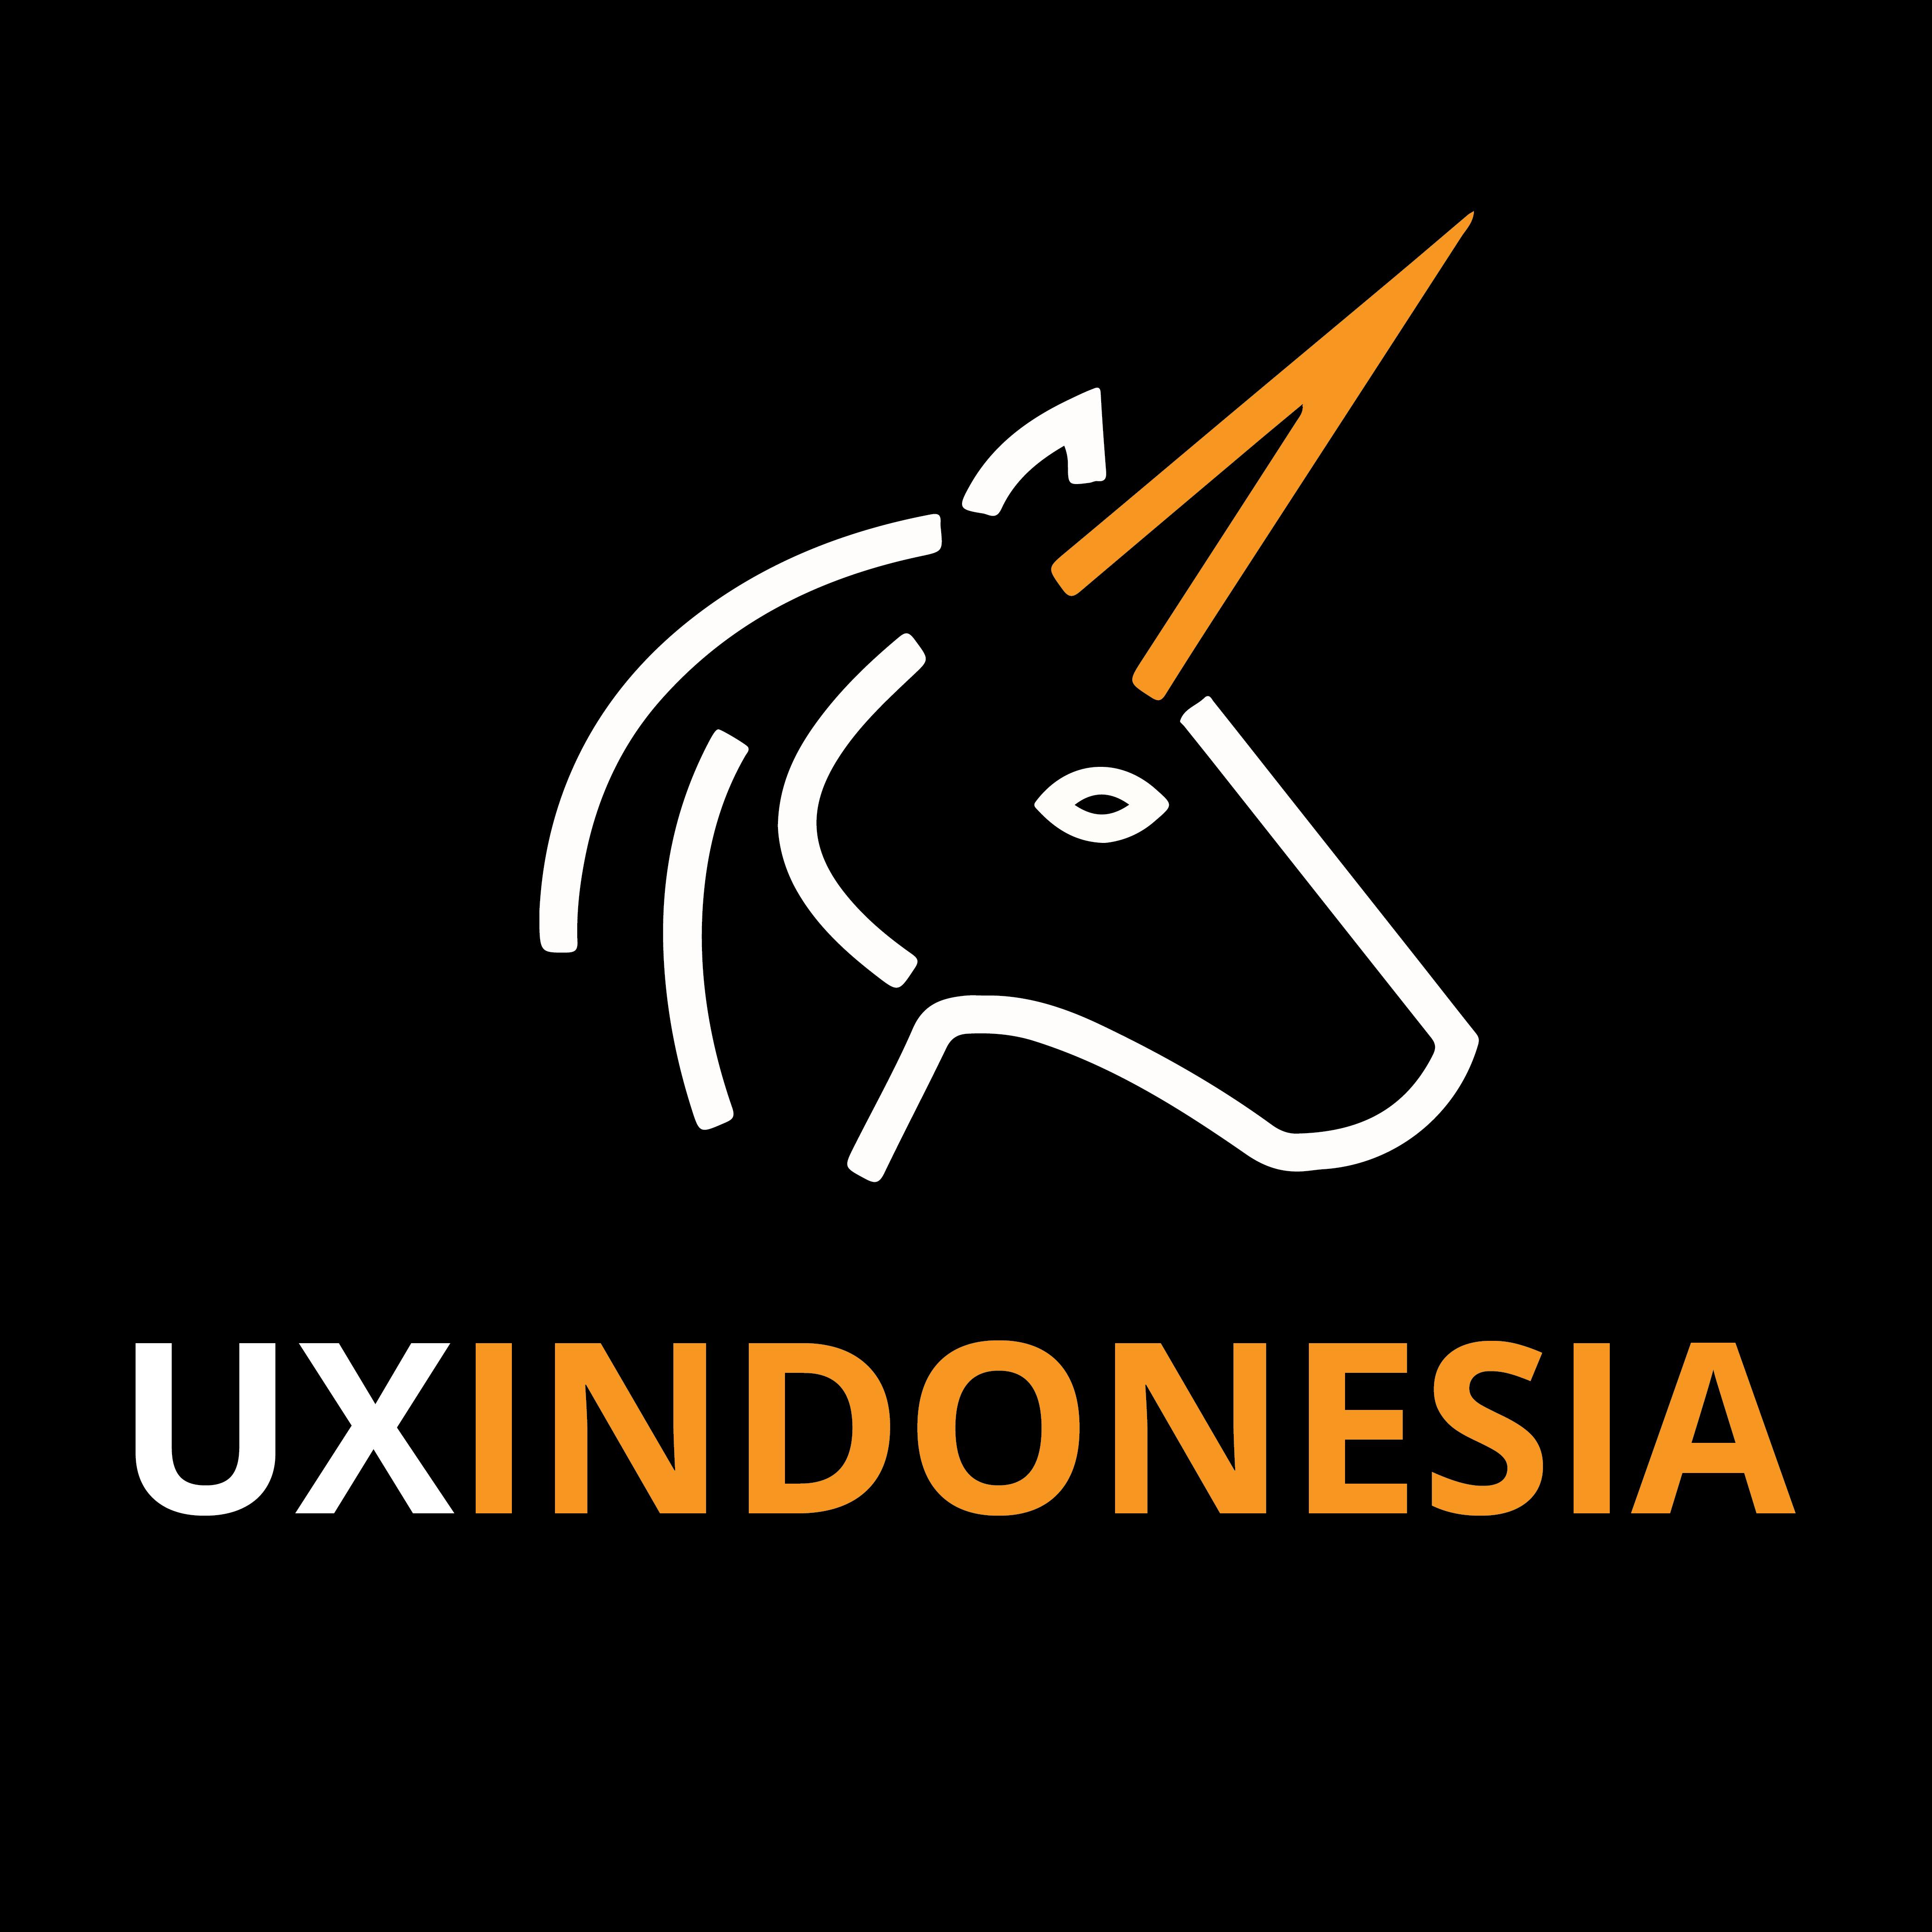 UX Indonesia company logo